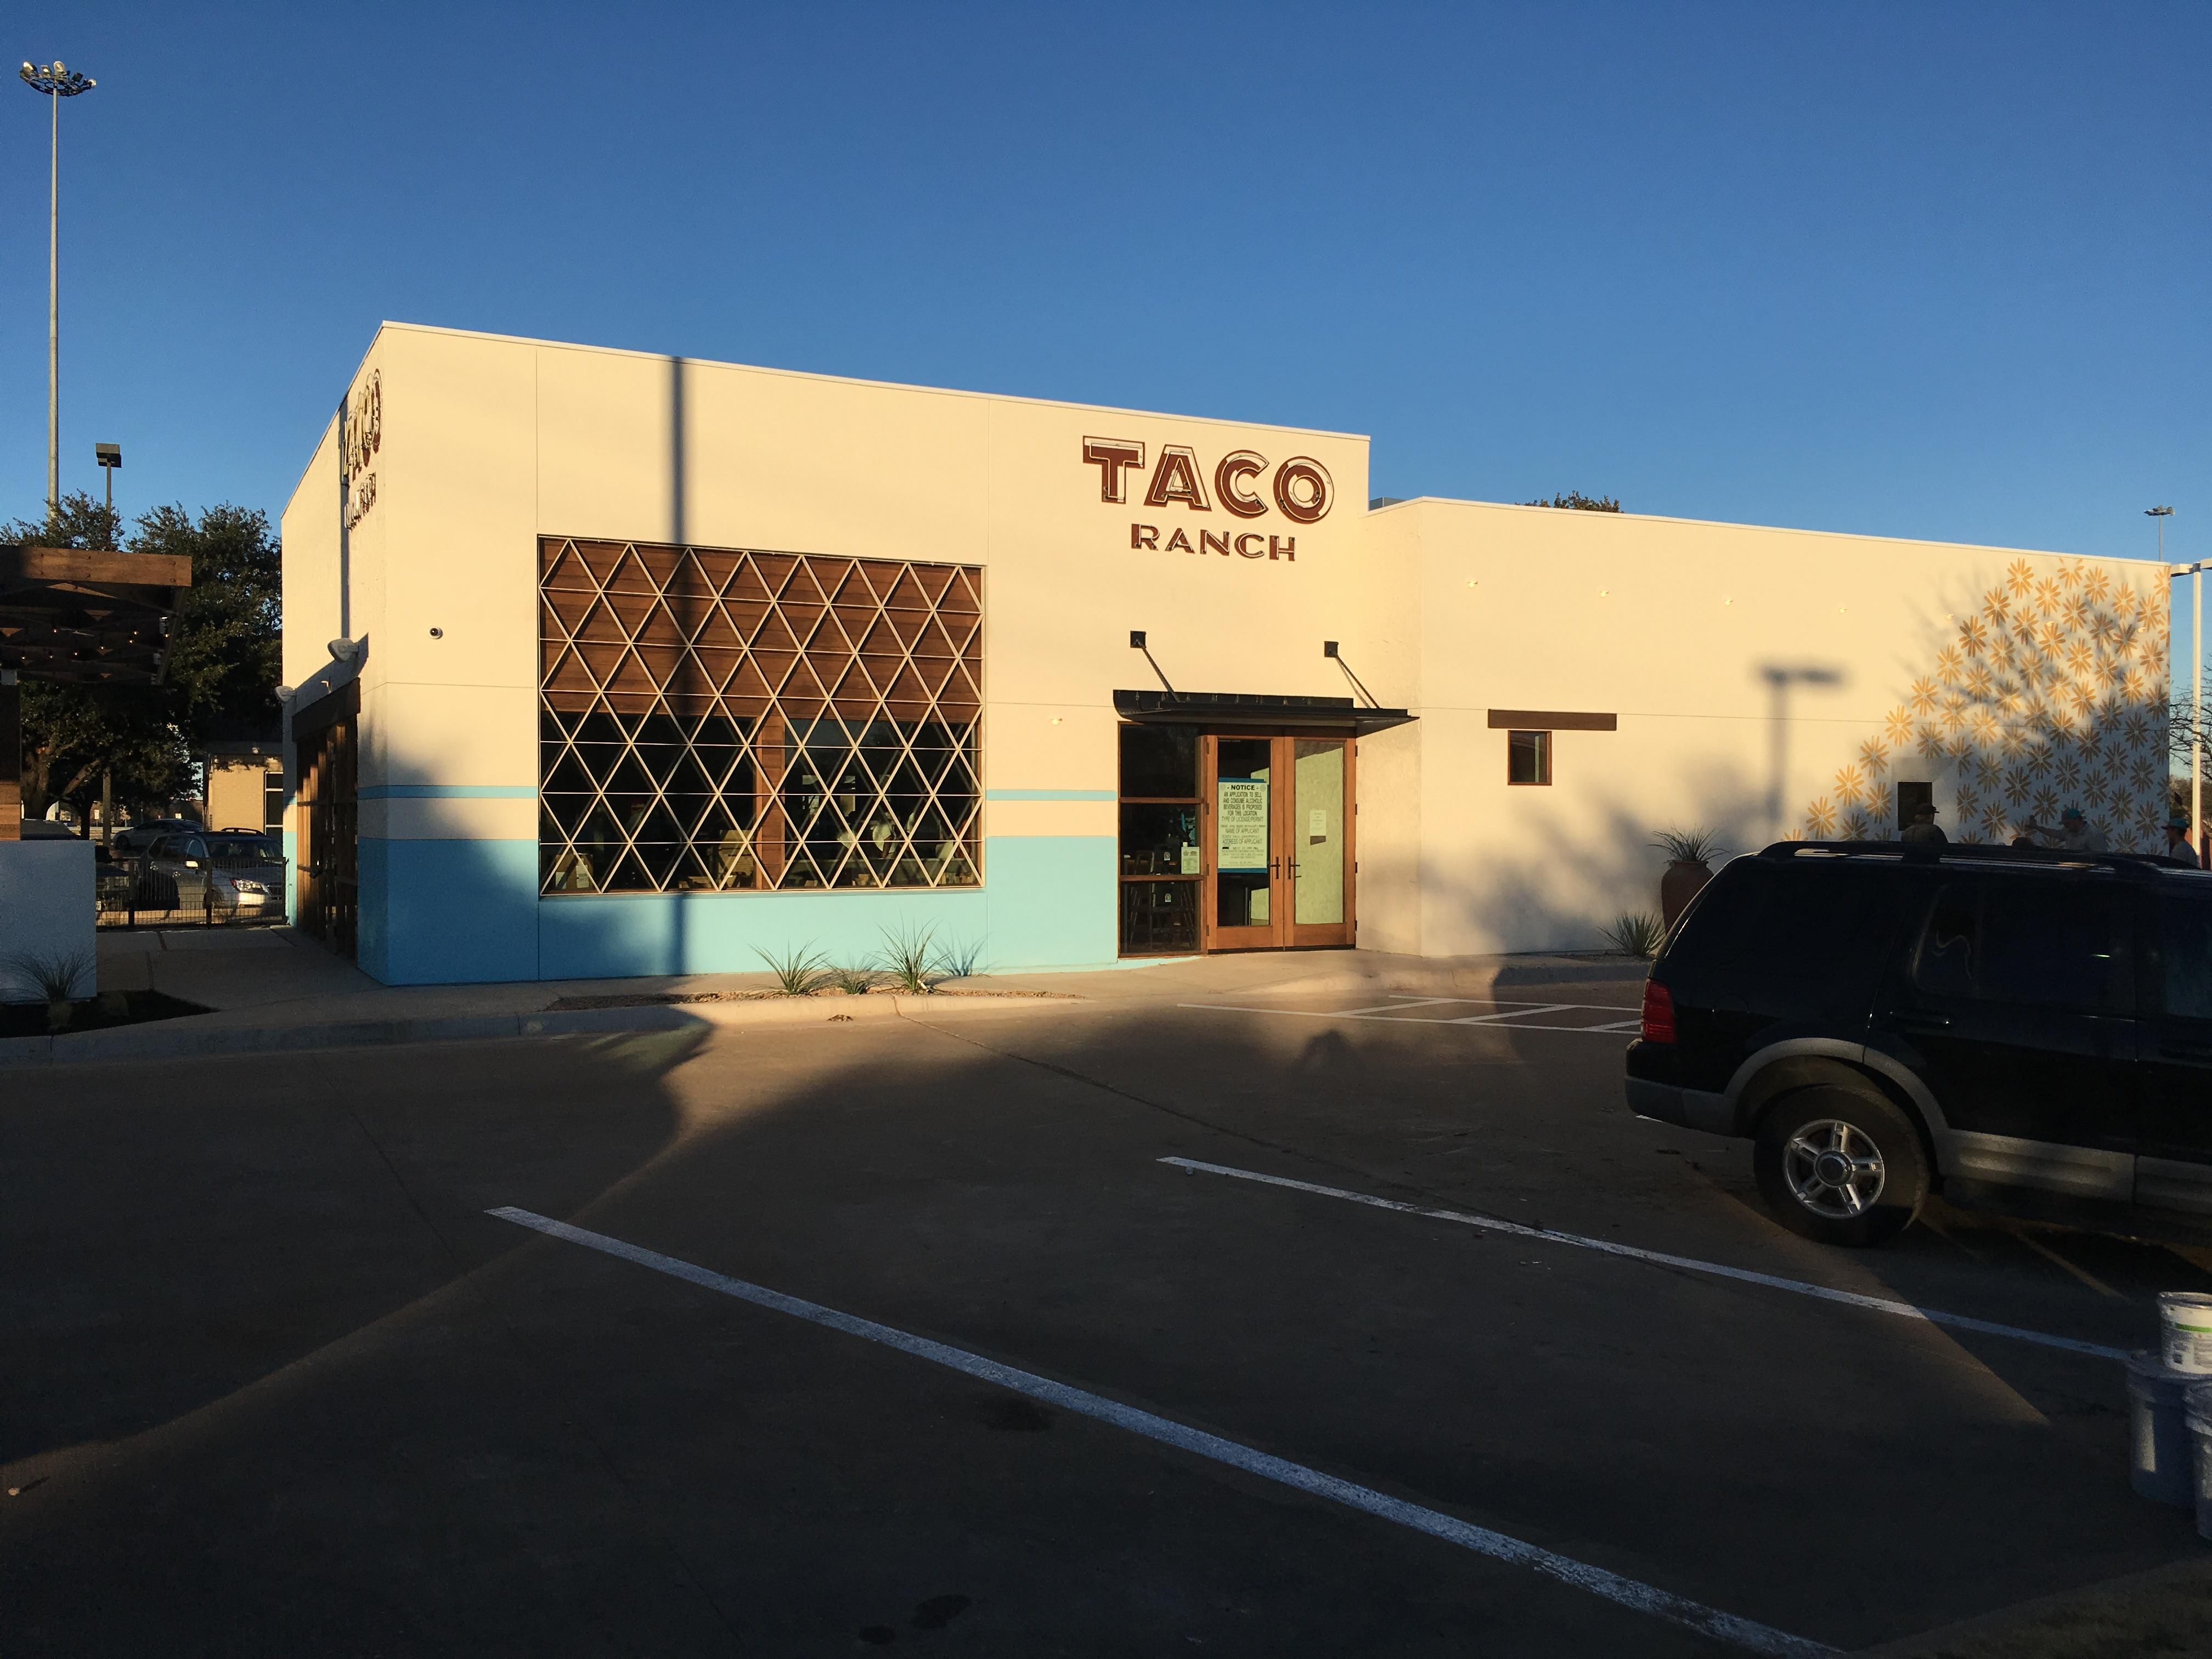 Taco Ranch